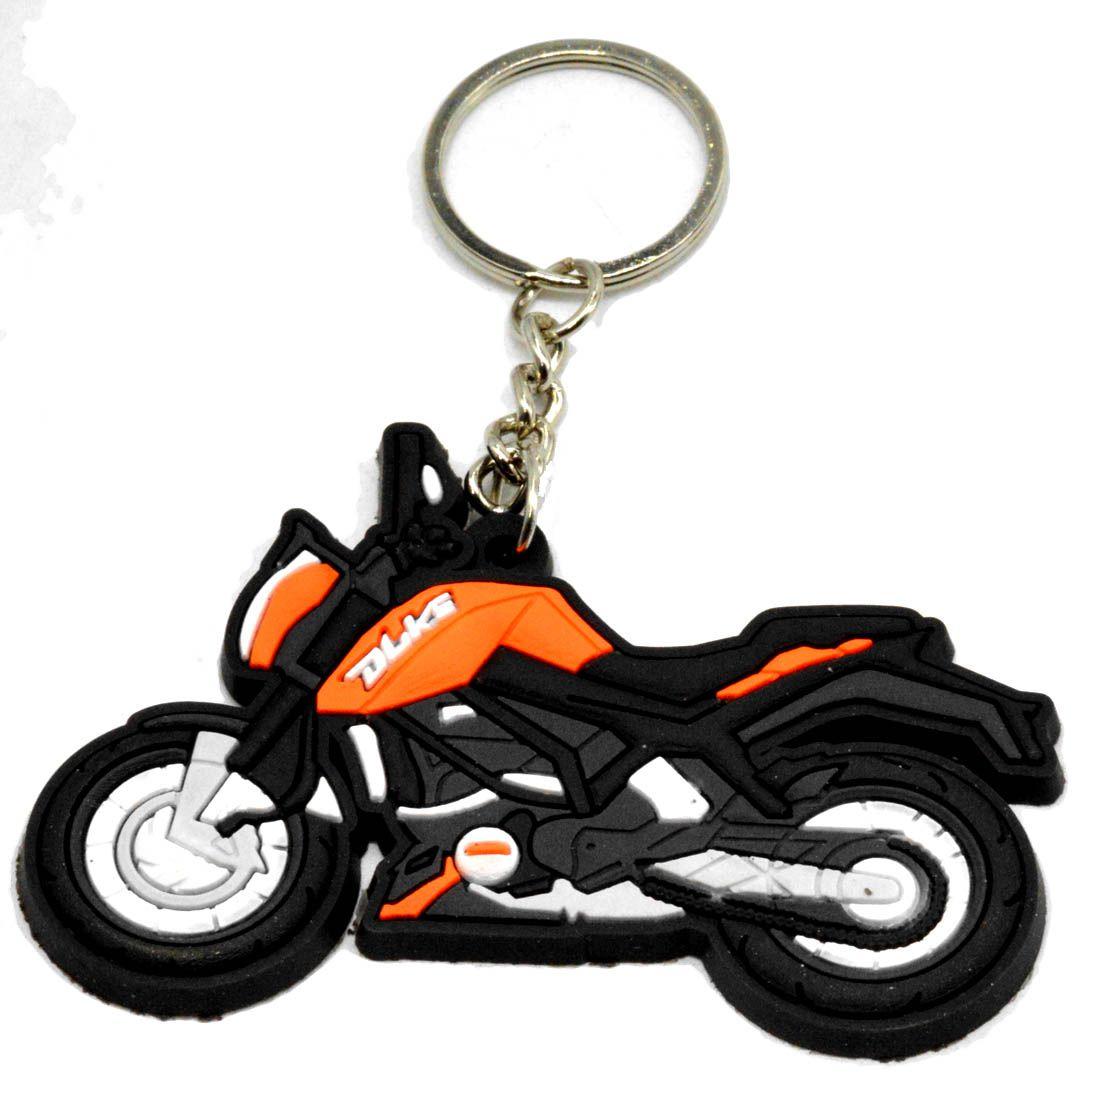 Faynci Duke Bike Logo Silicone Orange/Black/White Key Chain